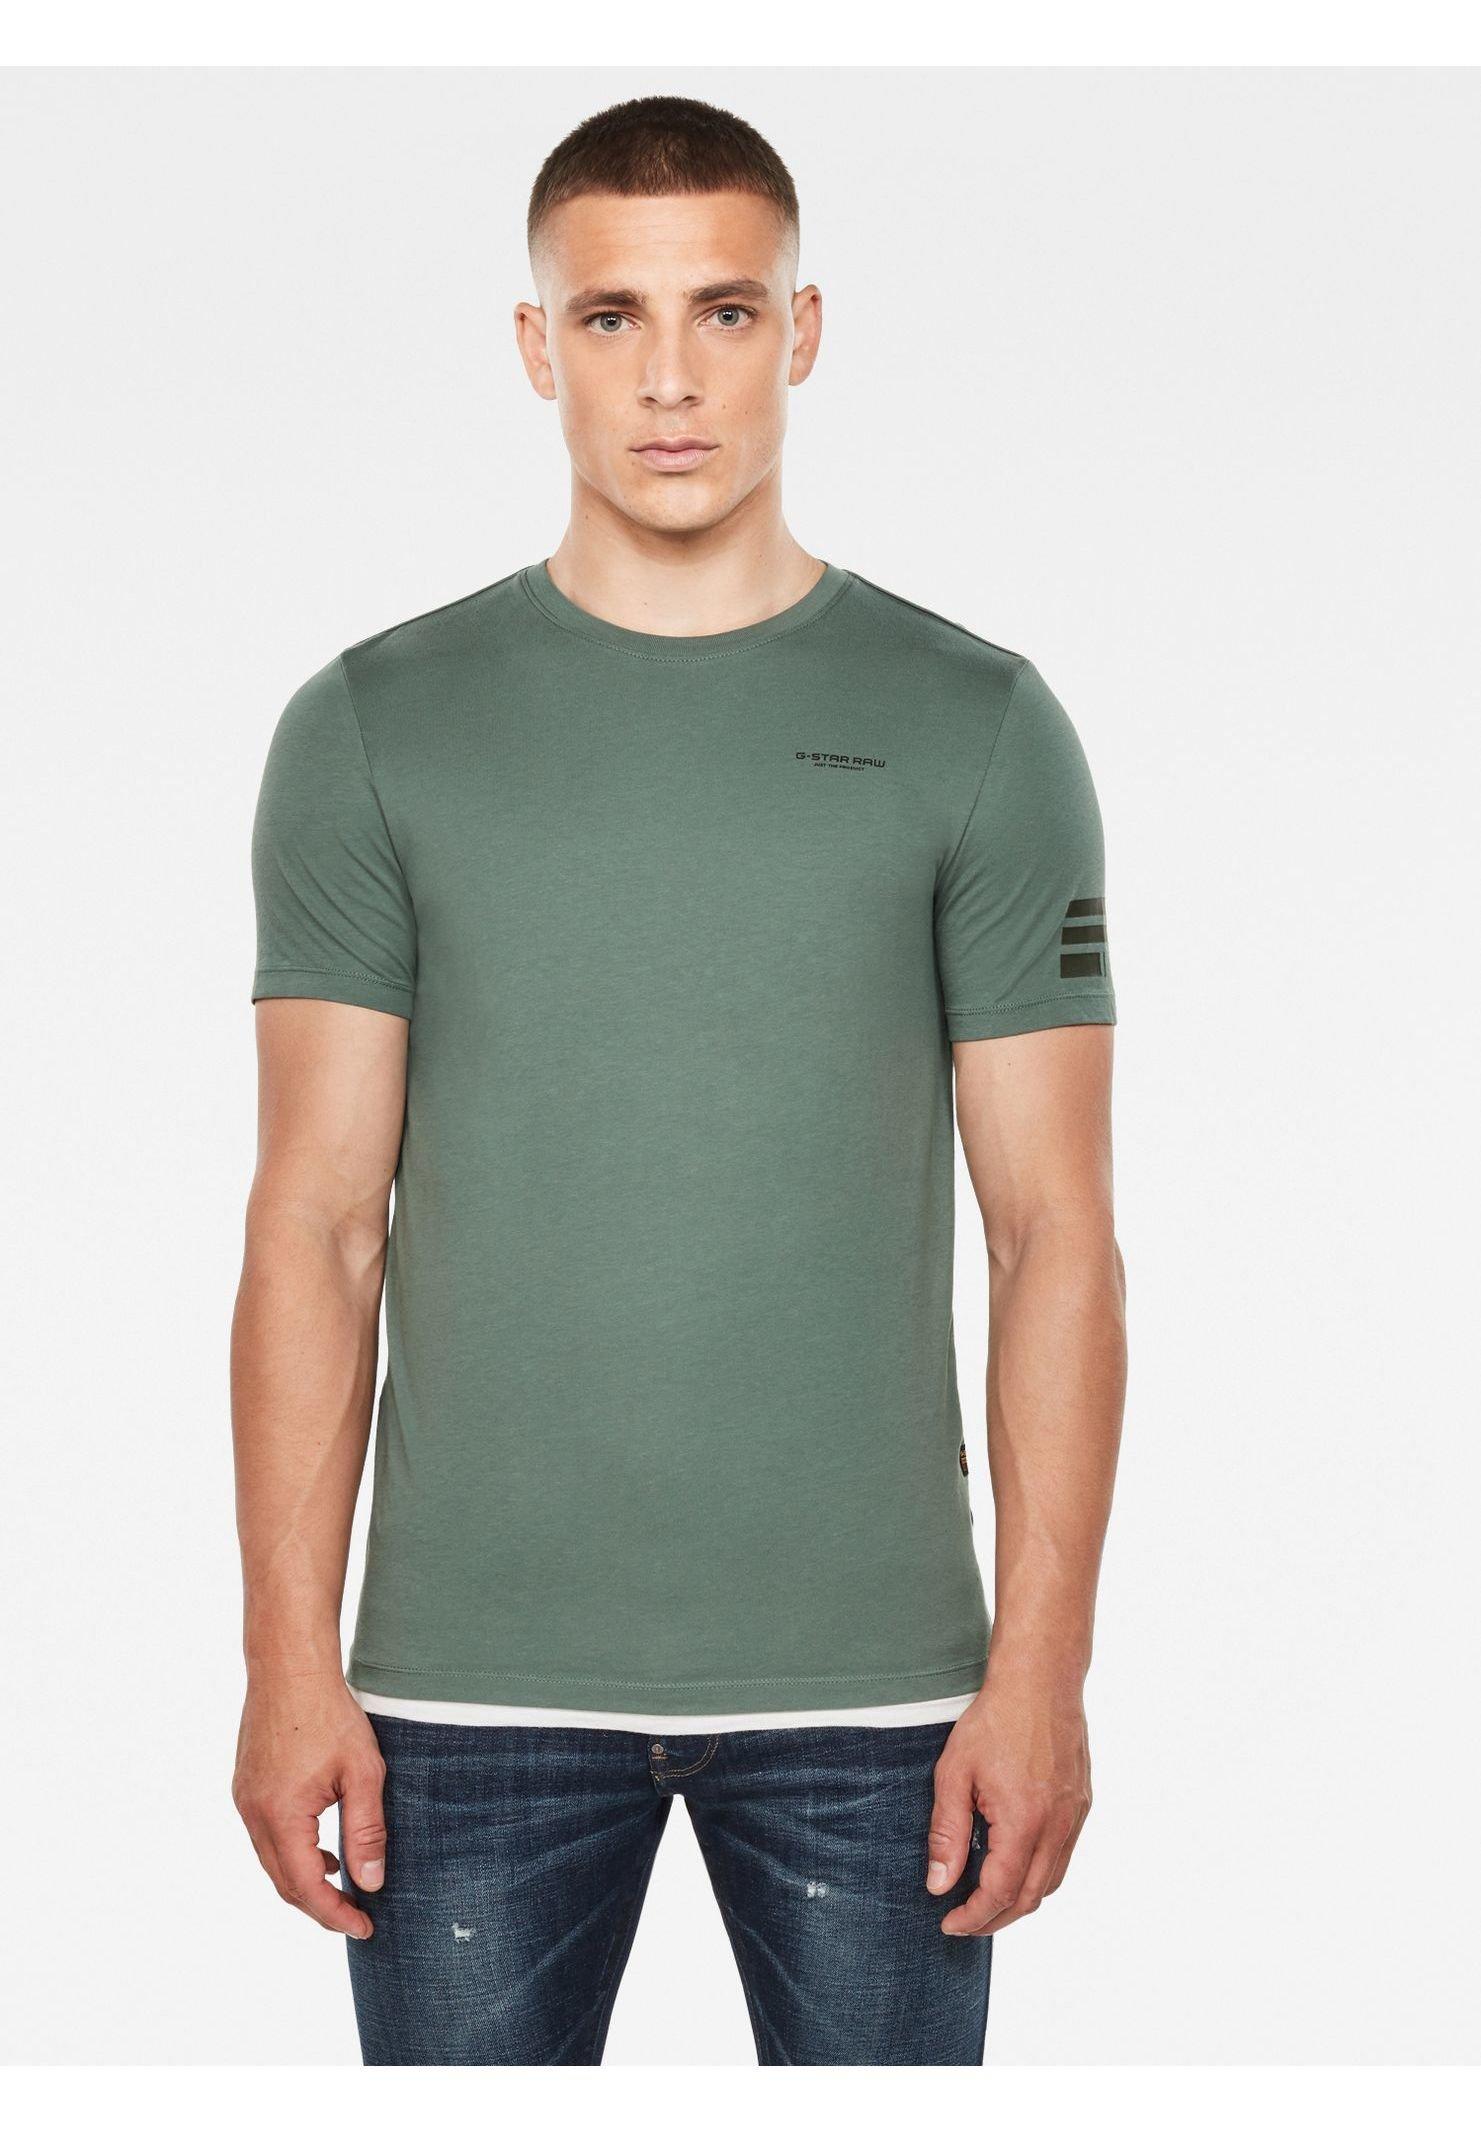 G Star TEXT GR SLIM T shirt imprimé shadow ZALANDO.FR